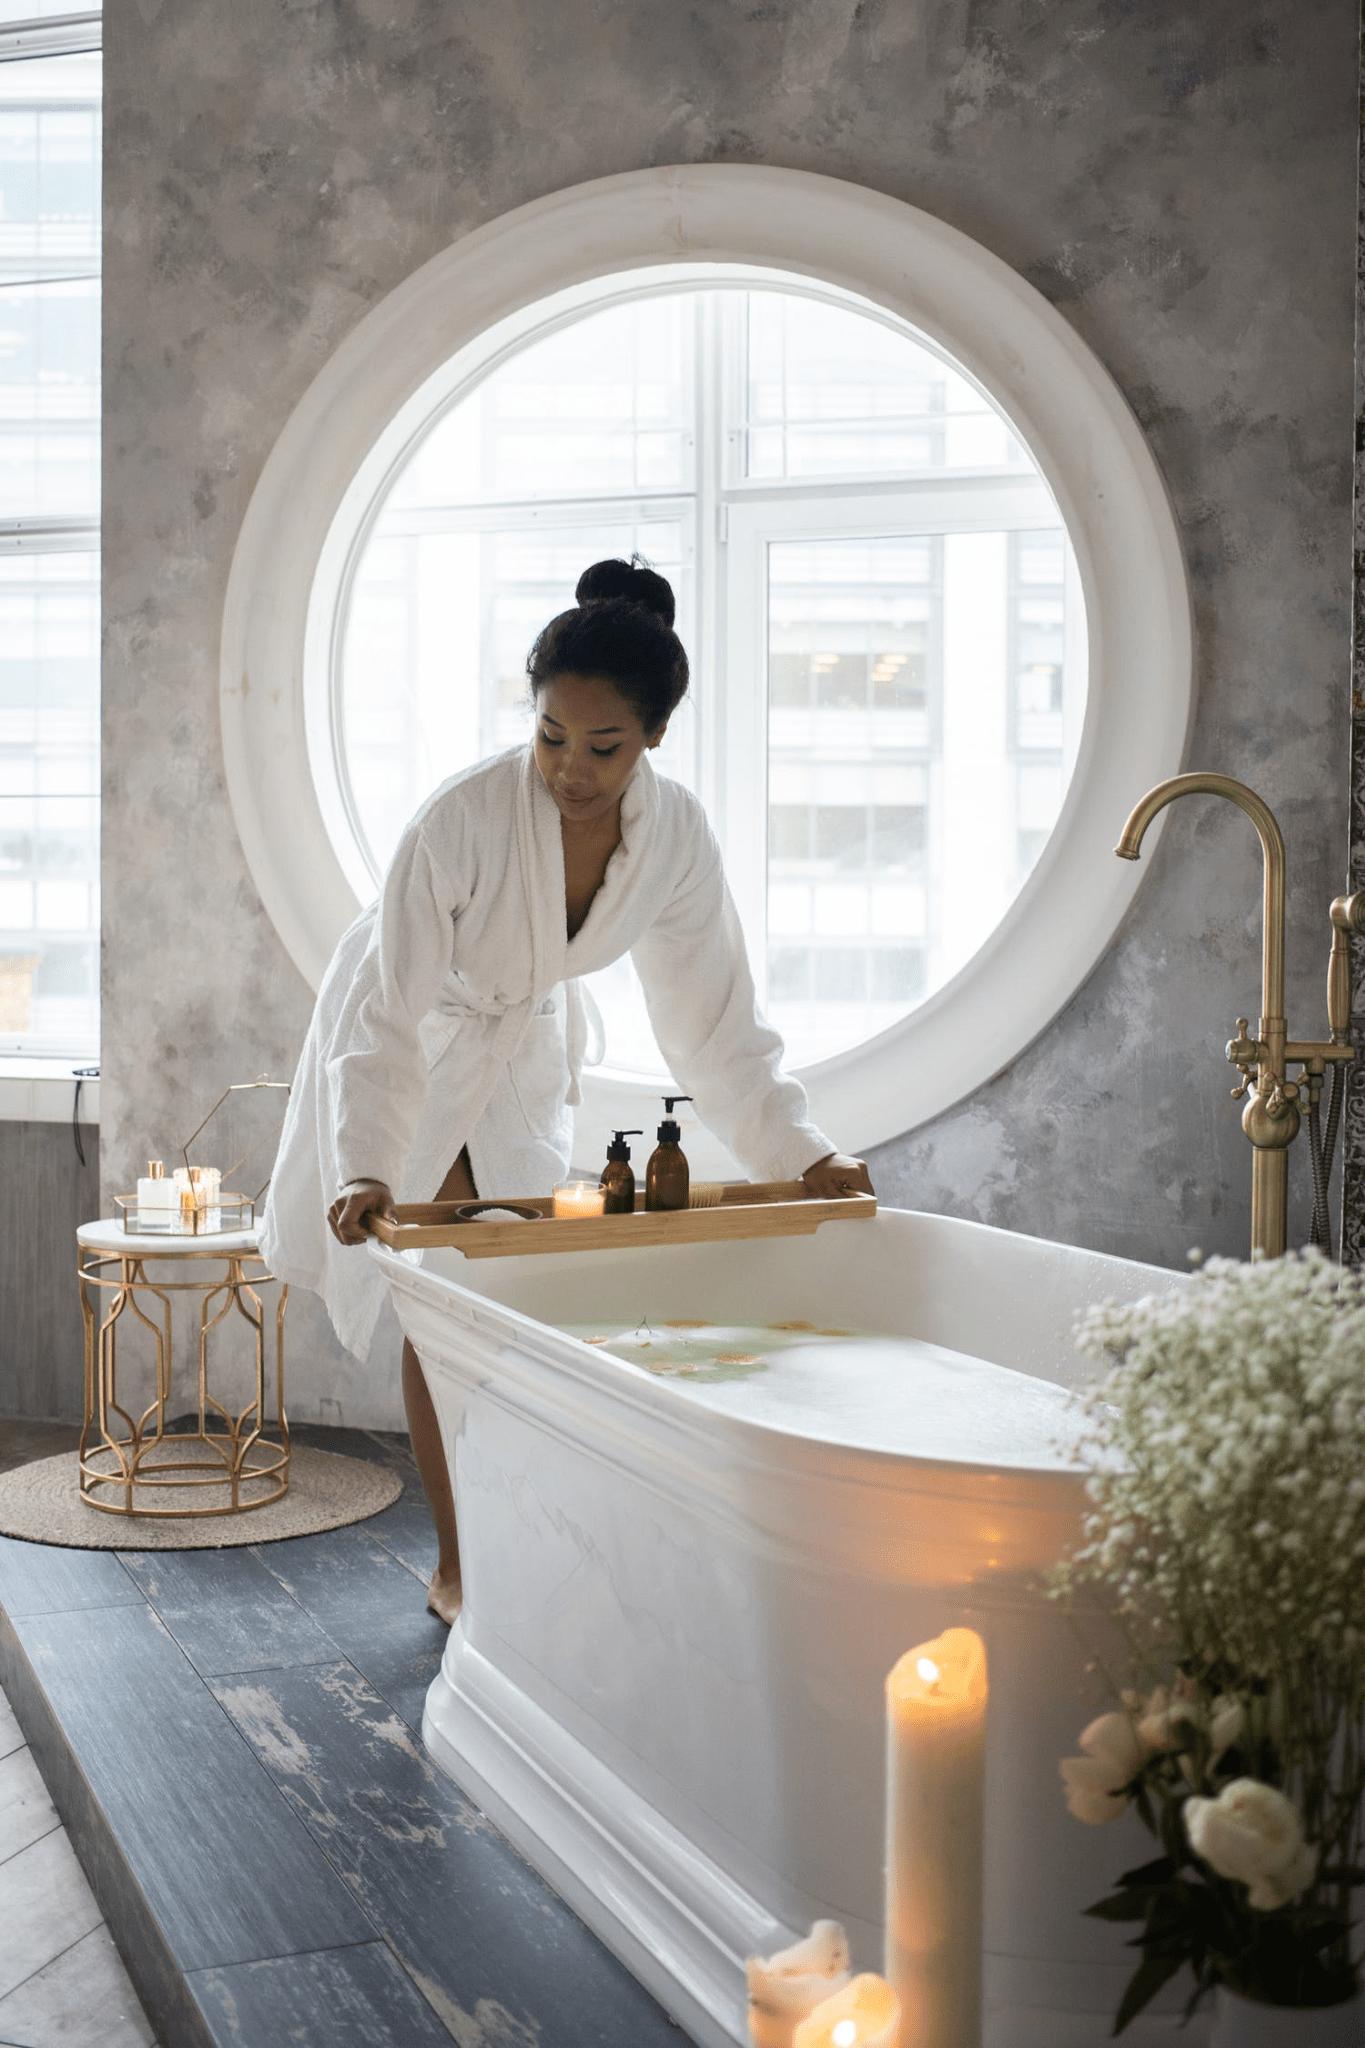 Benefits Of Having Tubs In Your Bathroom